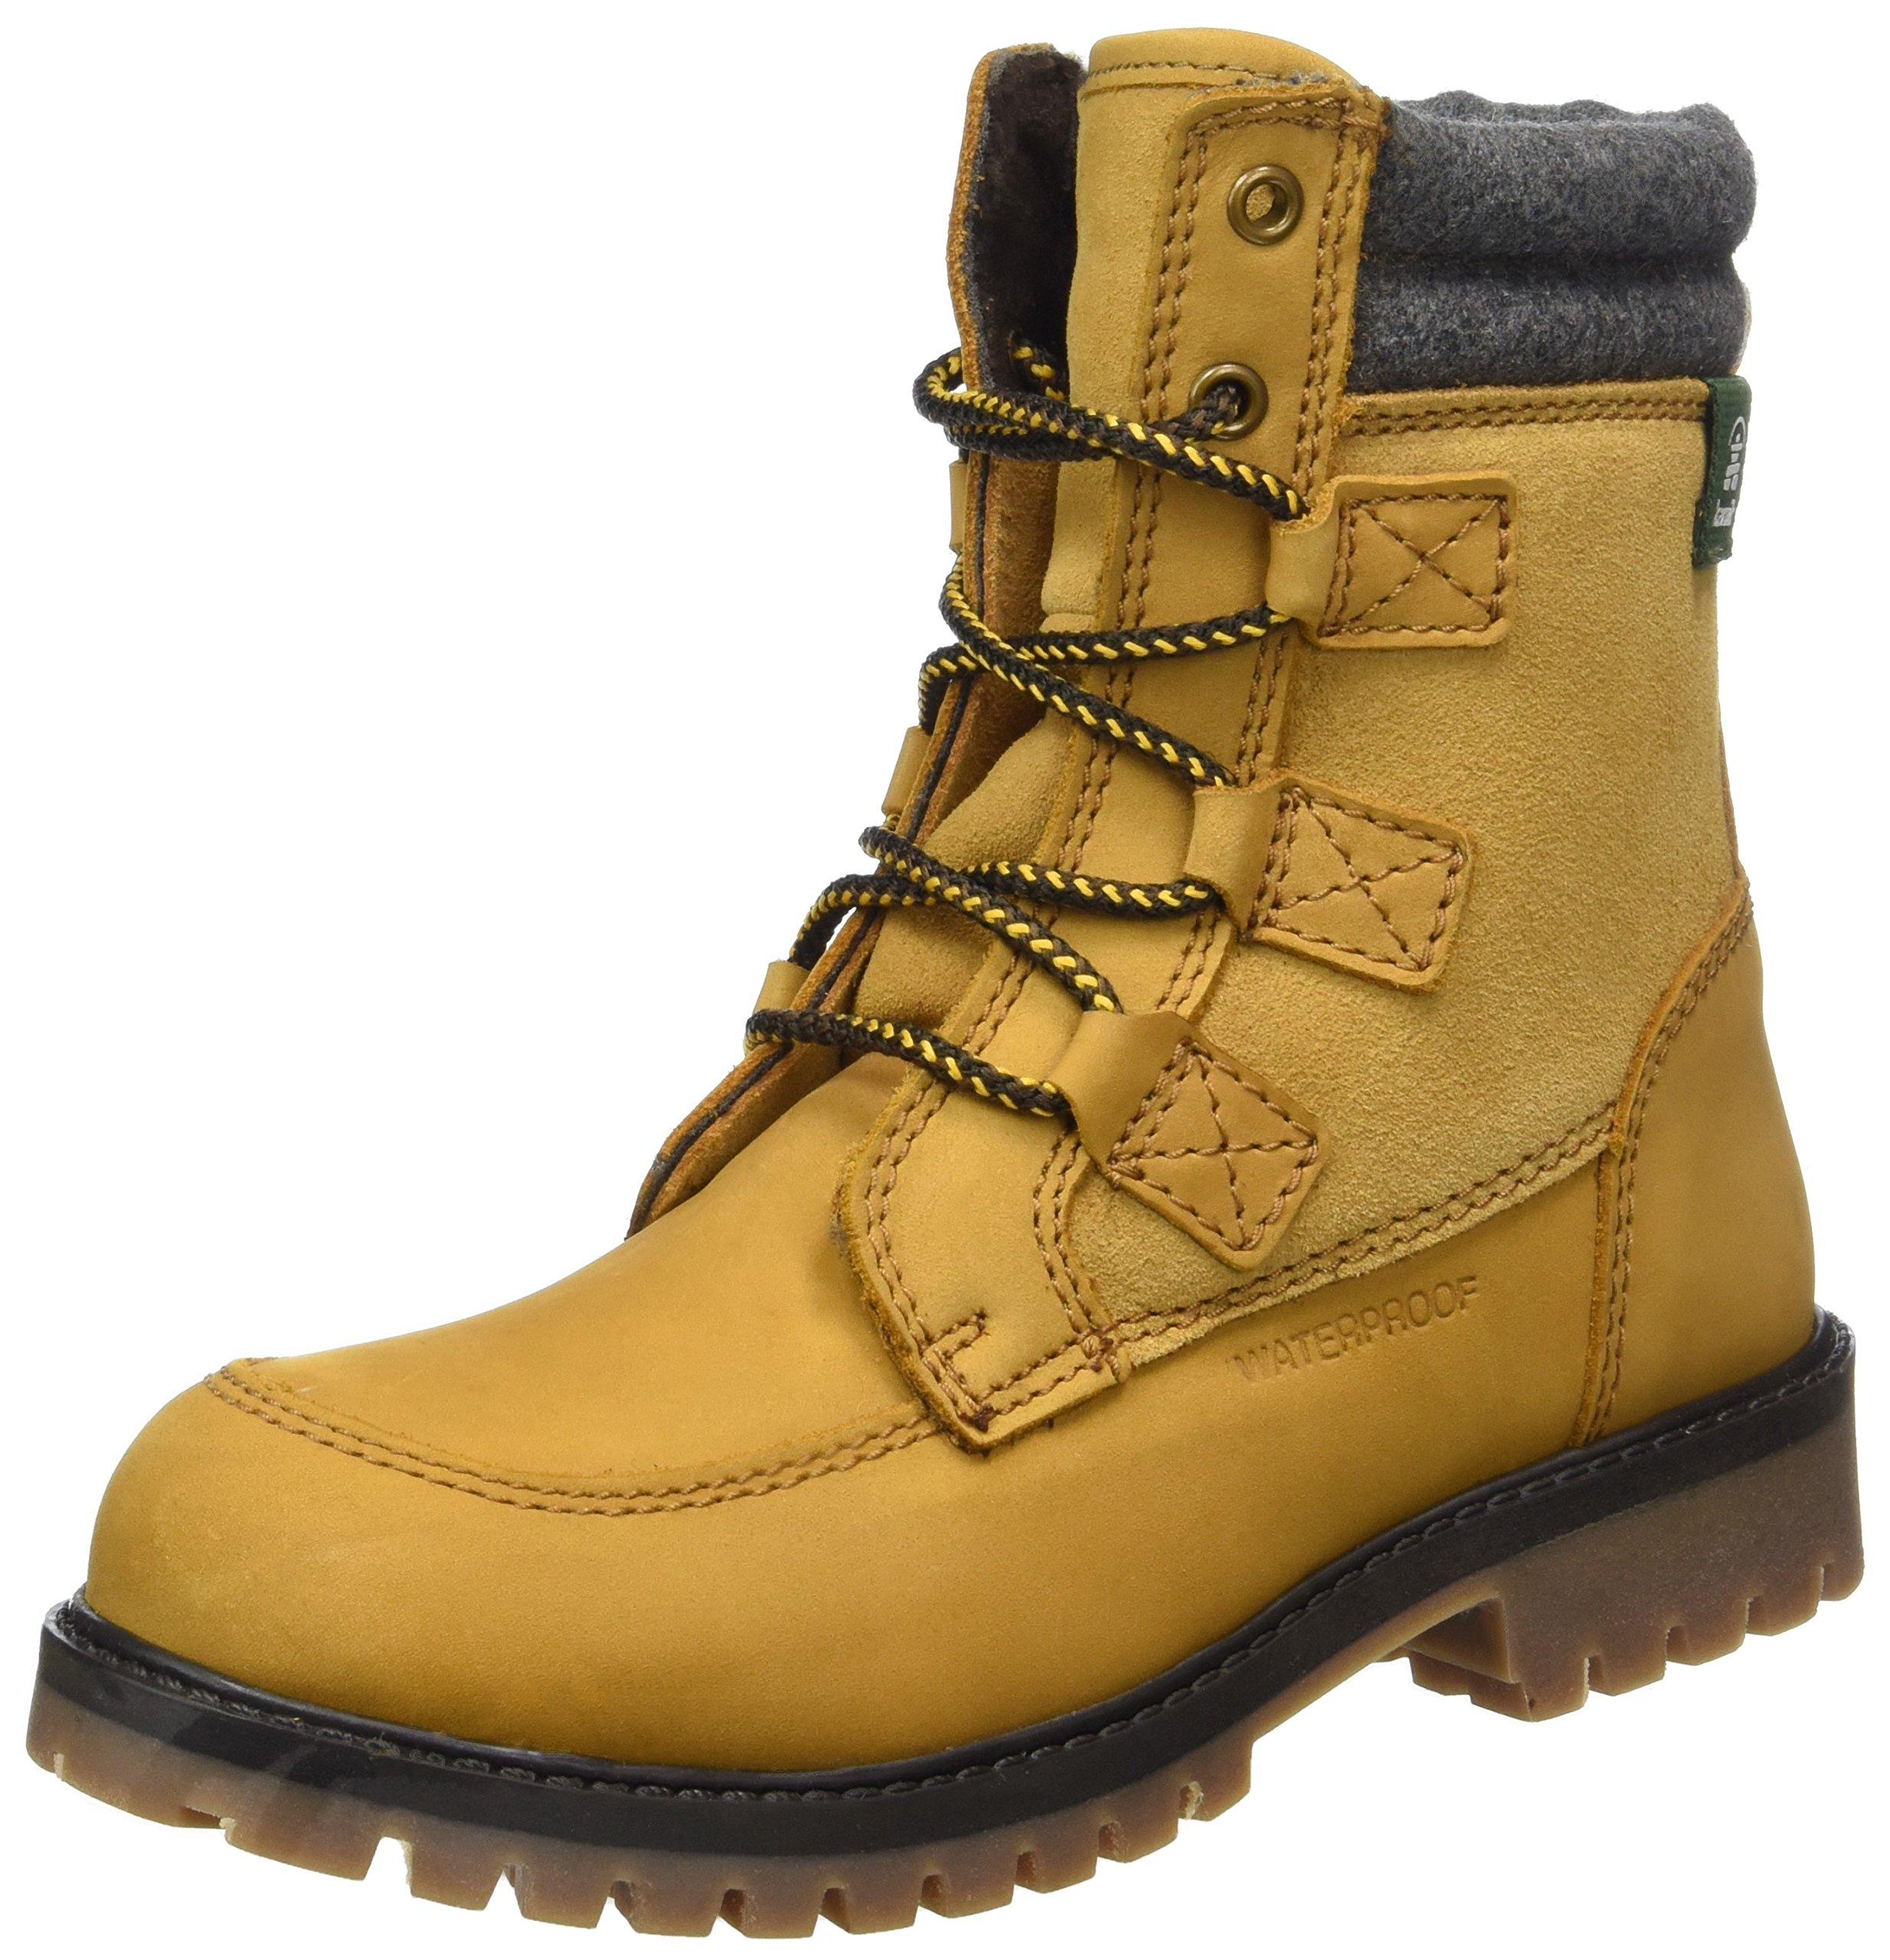 Kamik Takodalo Winter Boot - Boys', Tan, Size 13 M Us Wfyw